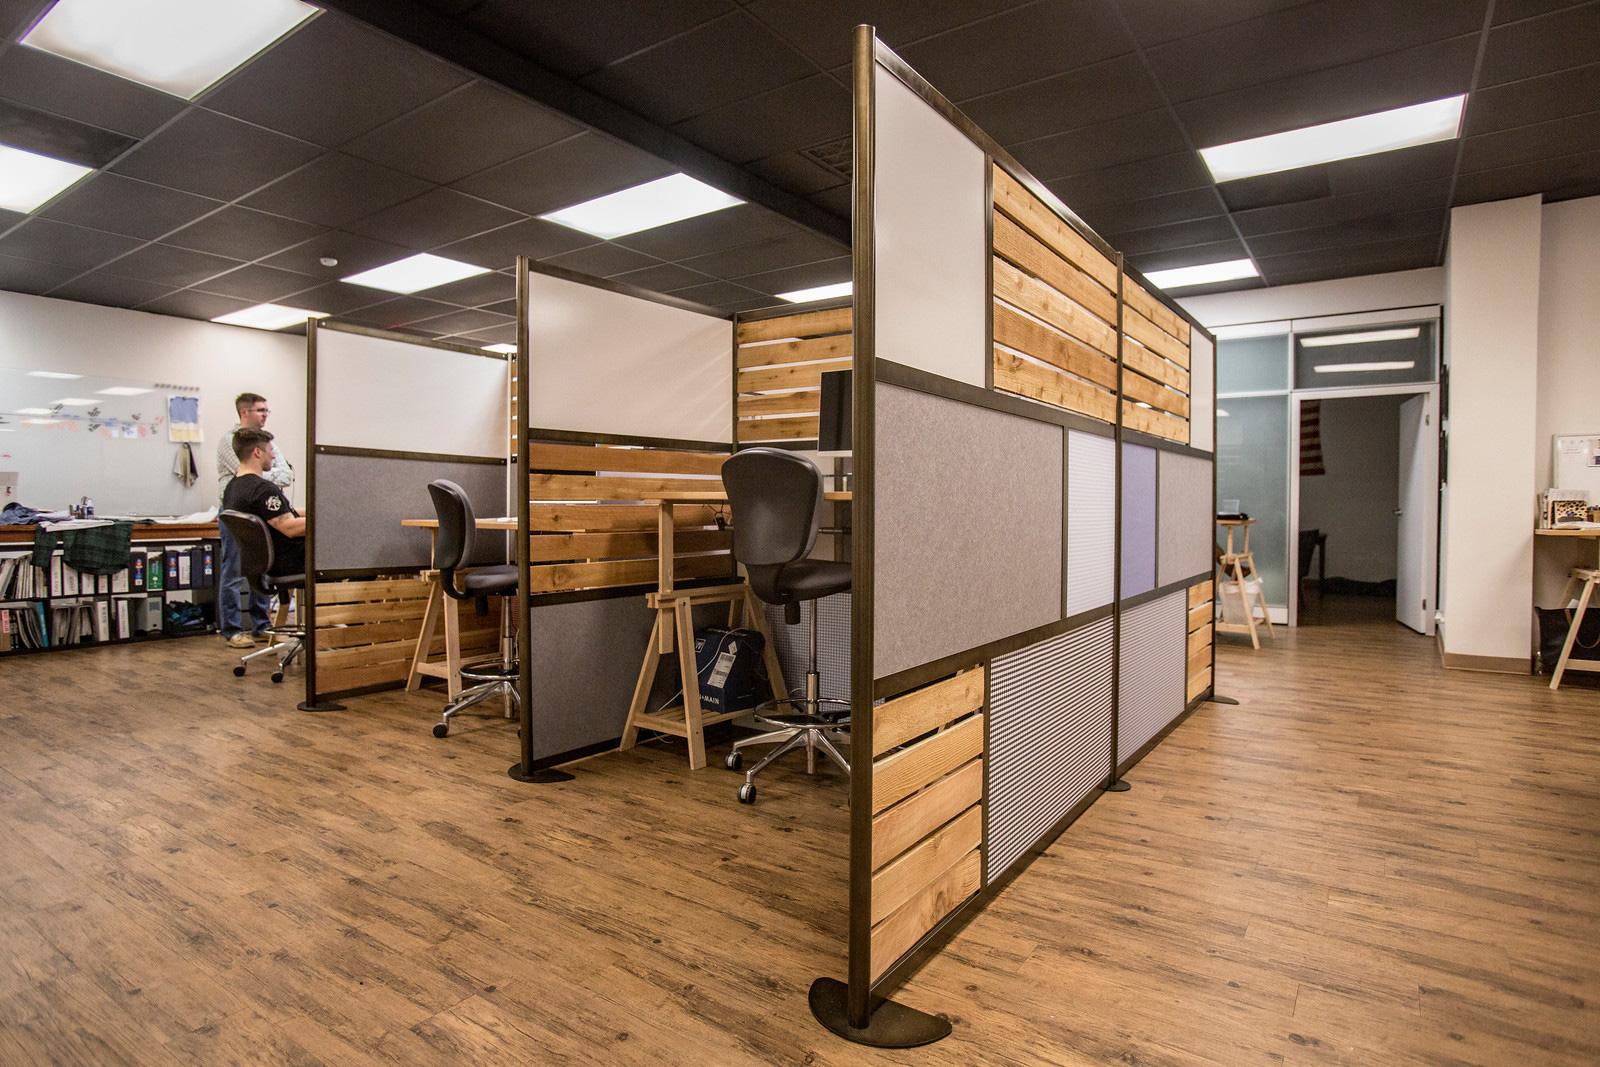 furniture-cubicles-in-jacksonville-florida-3-.jpg